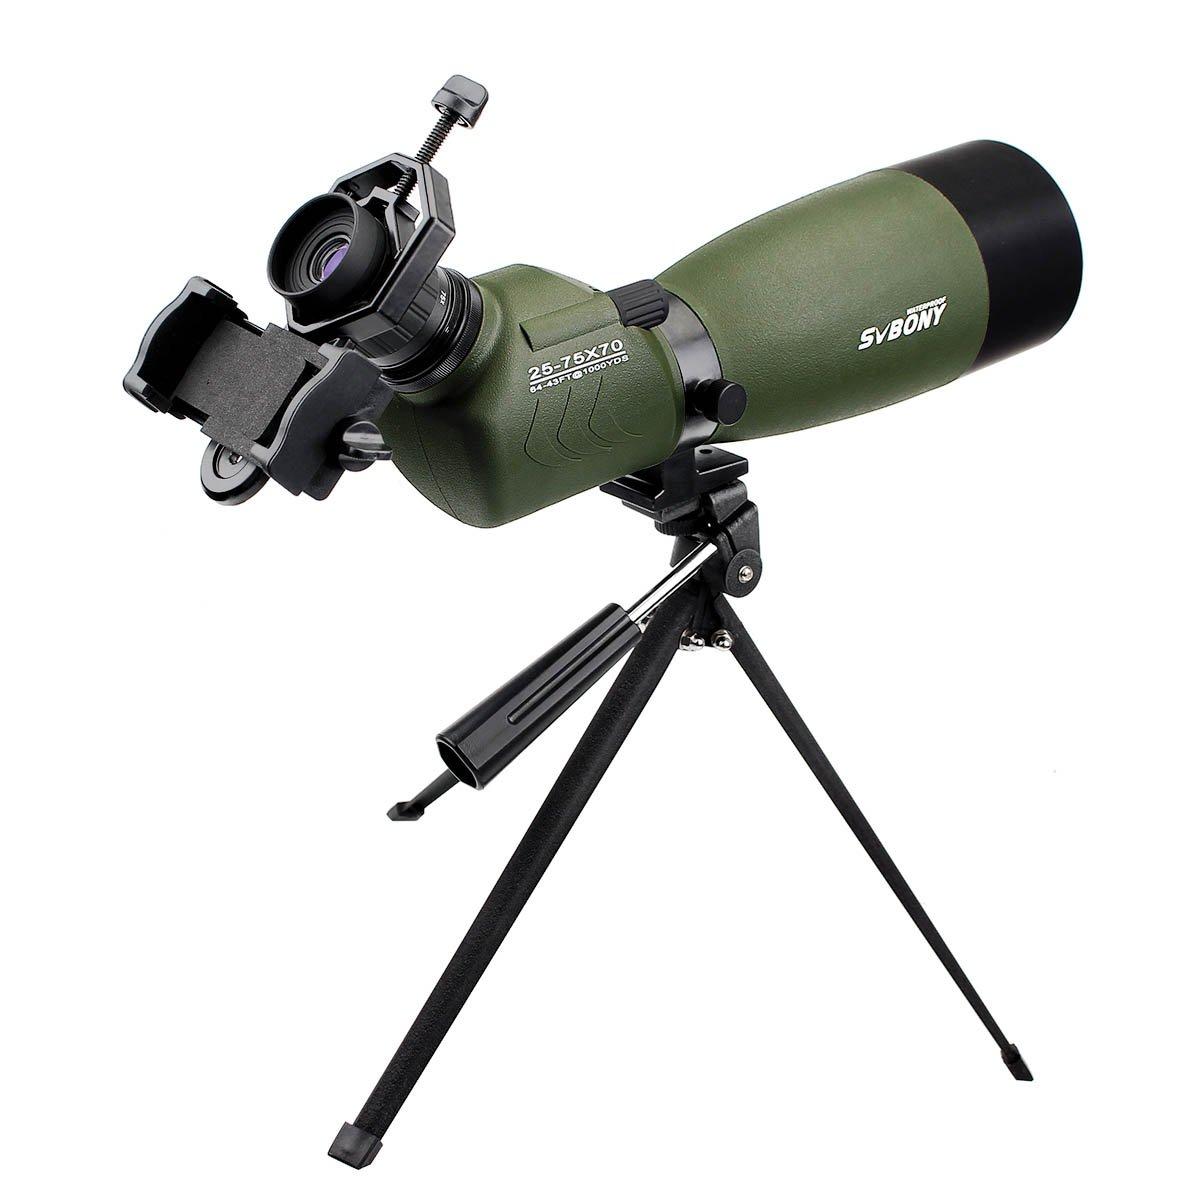 SVBONY 20-60x60/25-75x70mm Shooting Spotting Scope Bak4 Prism Spotting Scope Telescope IP65 Waterproof FMC Optical Lens with Tripod and Phone Adapter